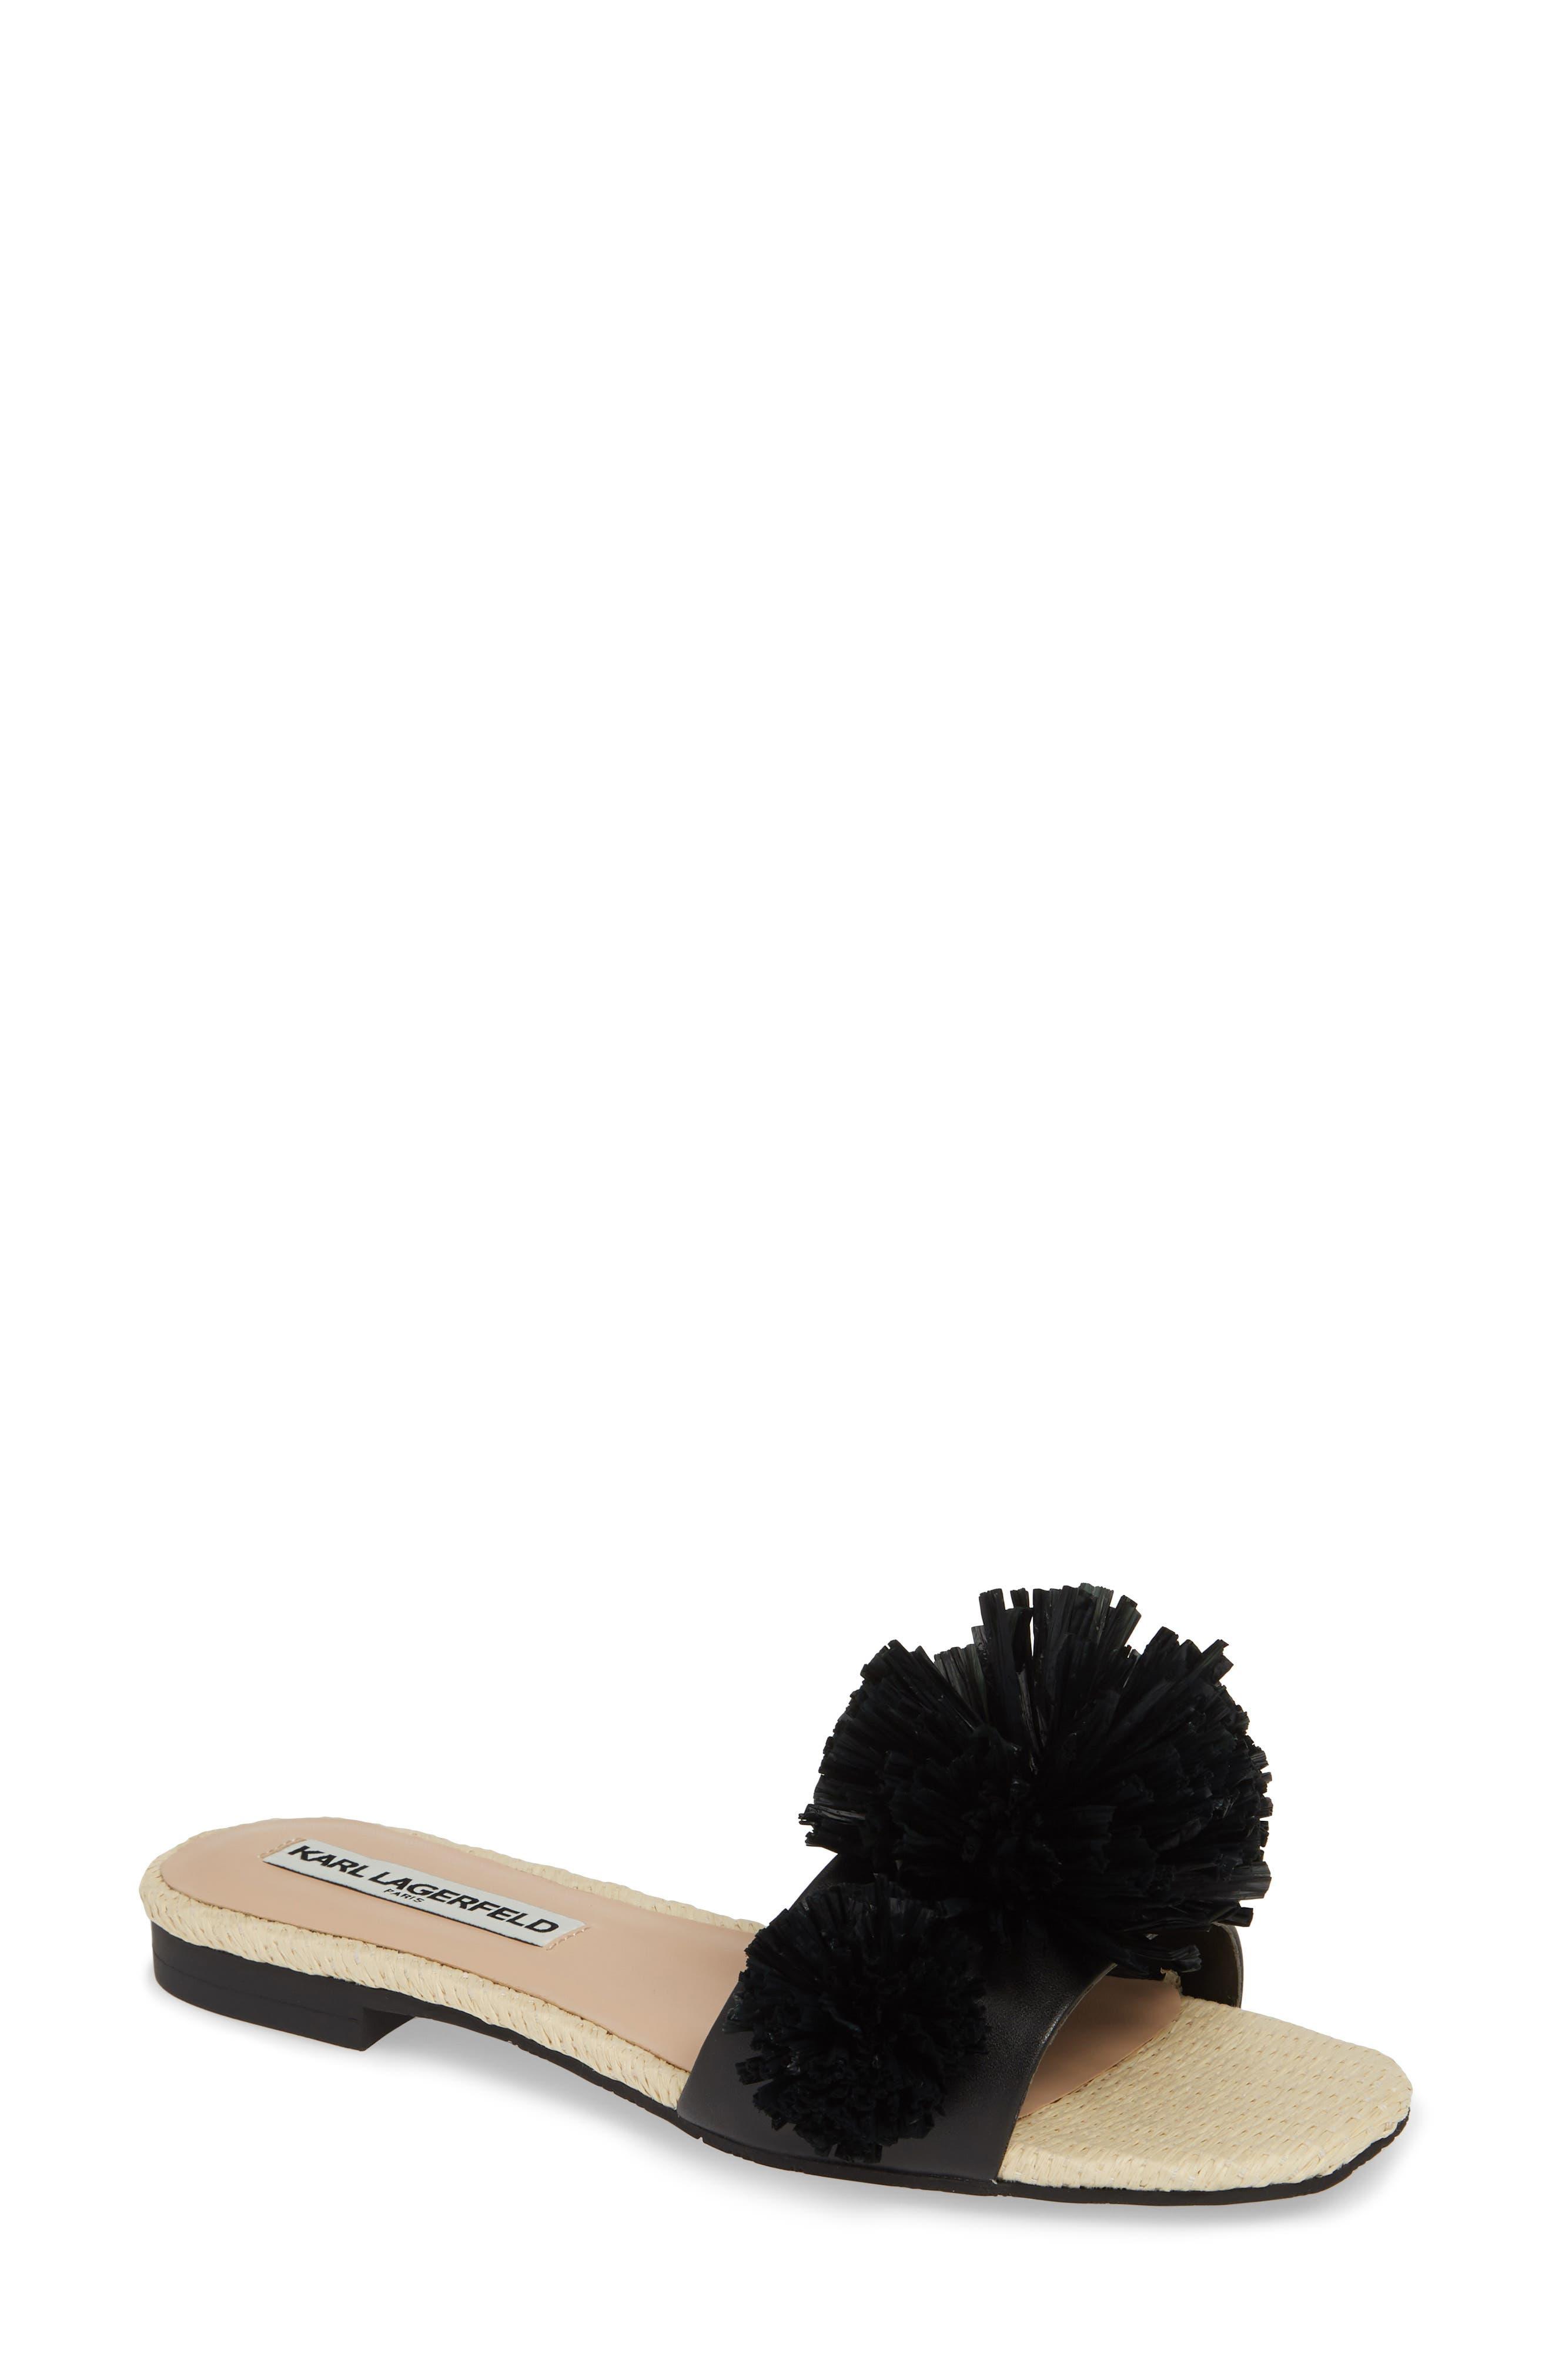 Karl Lagerfeld Paris Rainey Slide Sandal, Black